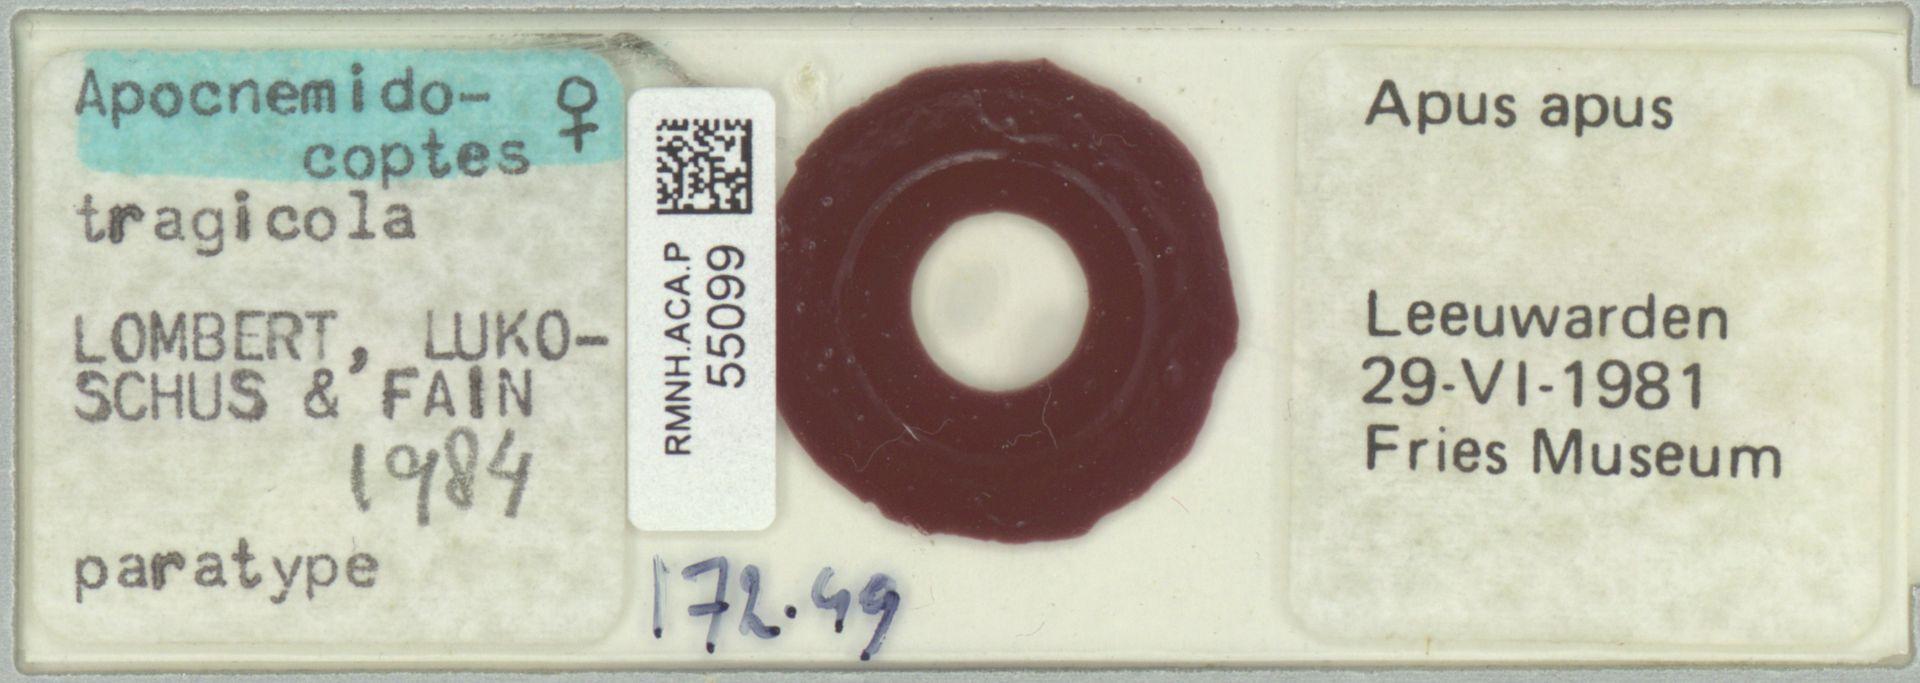 RMNH.ACA.P.55099 | Apocnemidocoptes tragicola Lombert, Lukoschus & Fain, 1984